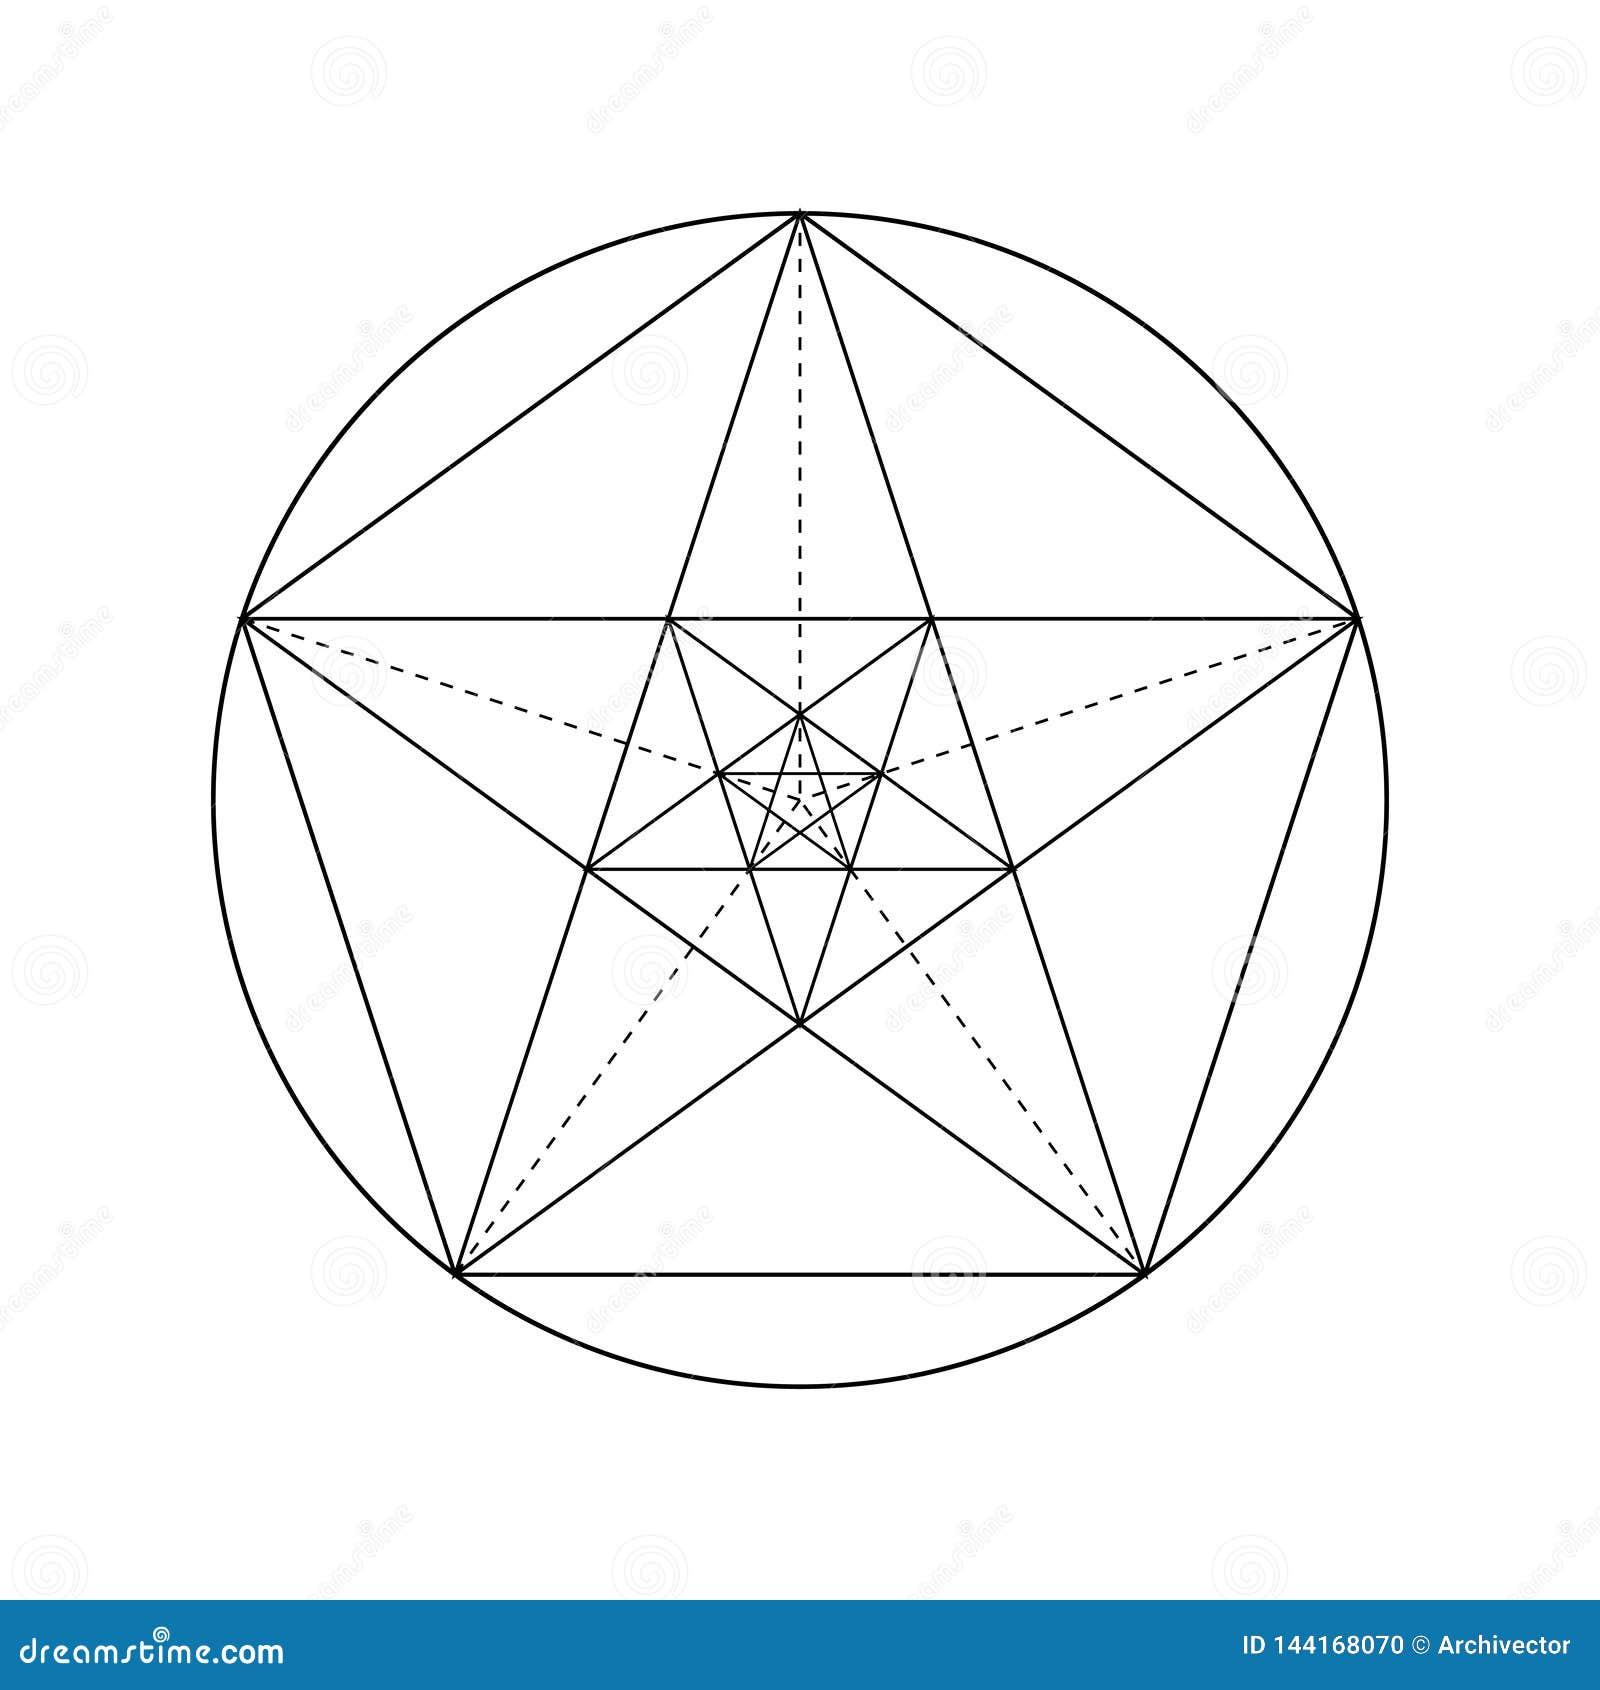 Pentagram star drawing